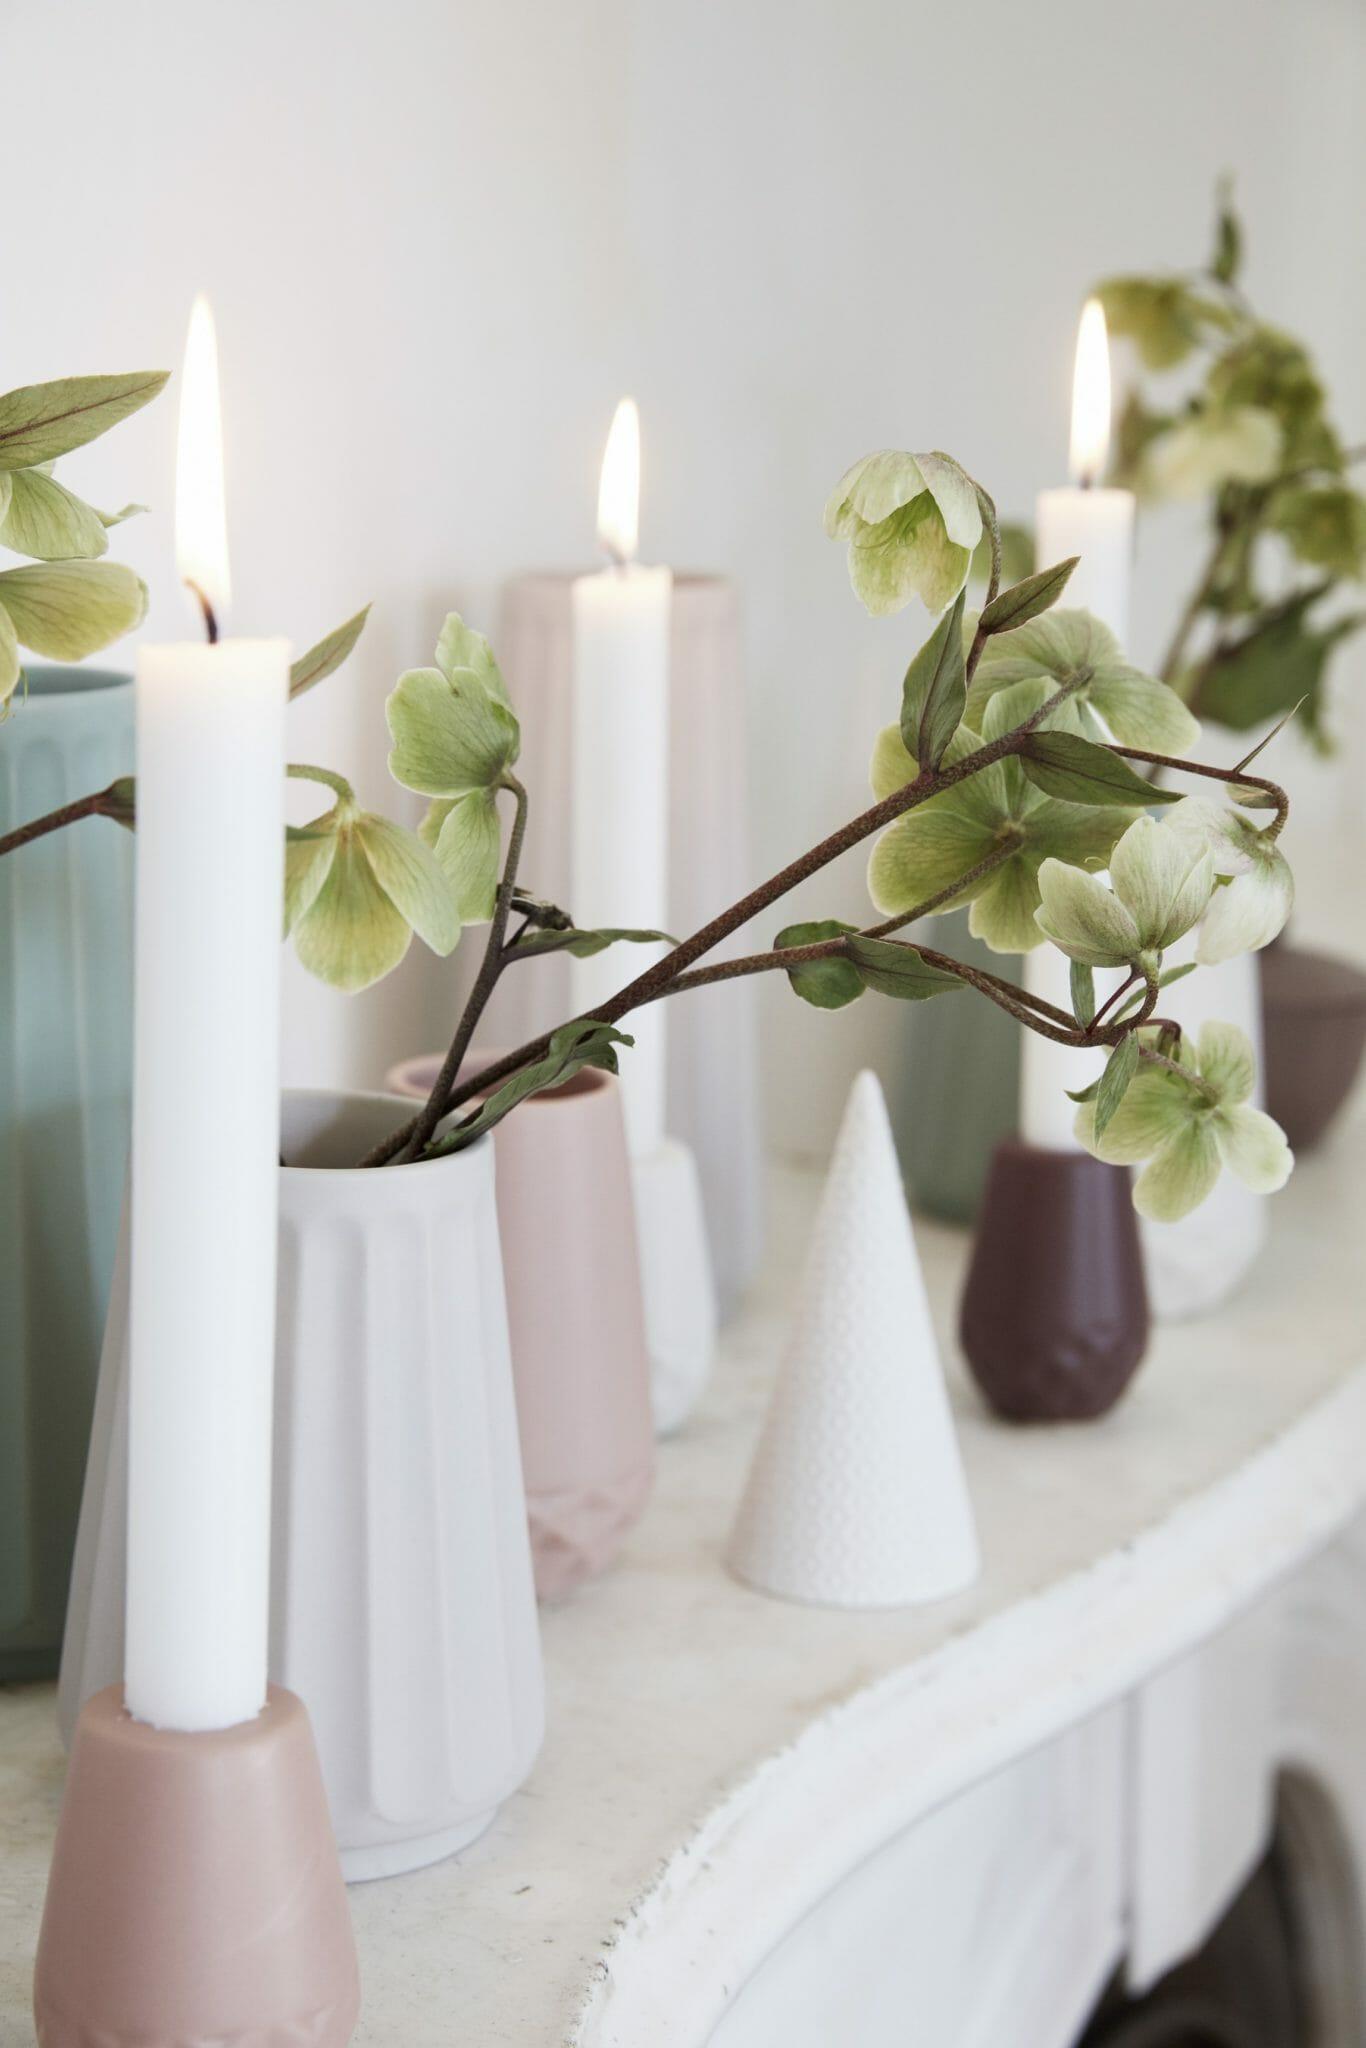 Sada keramických váz